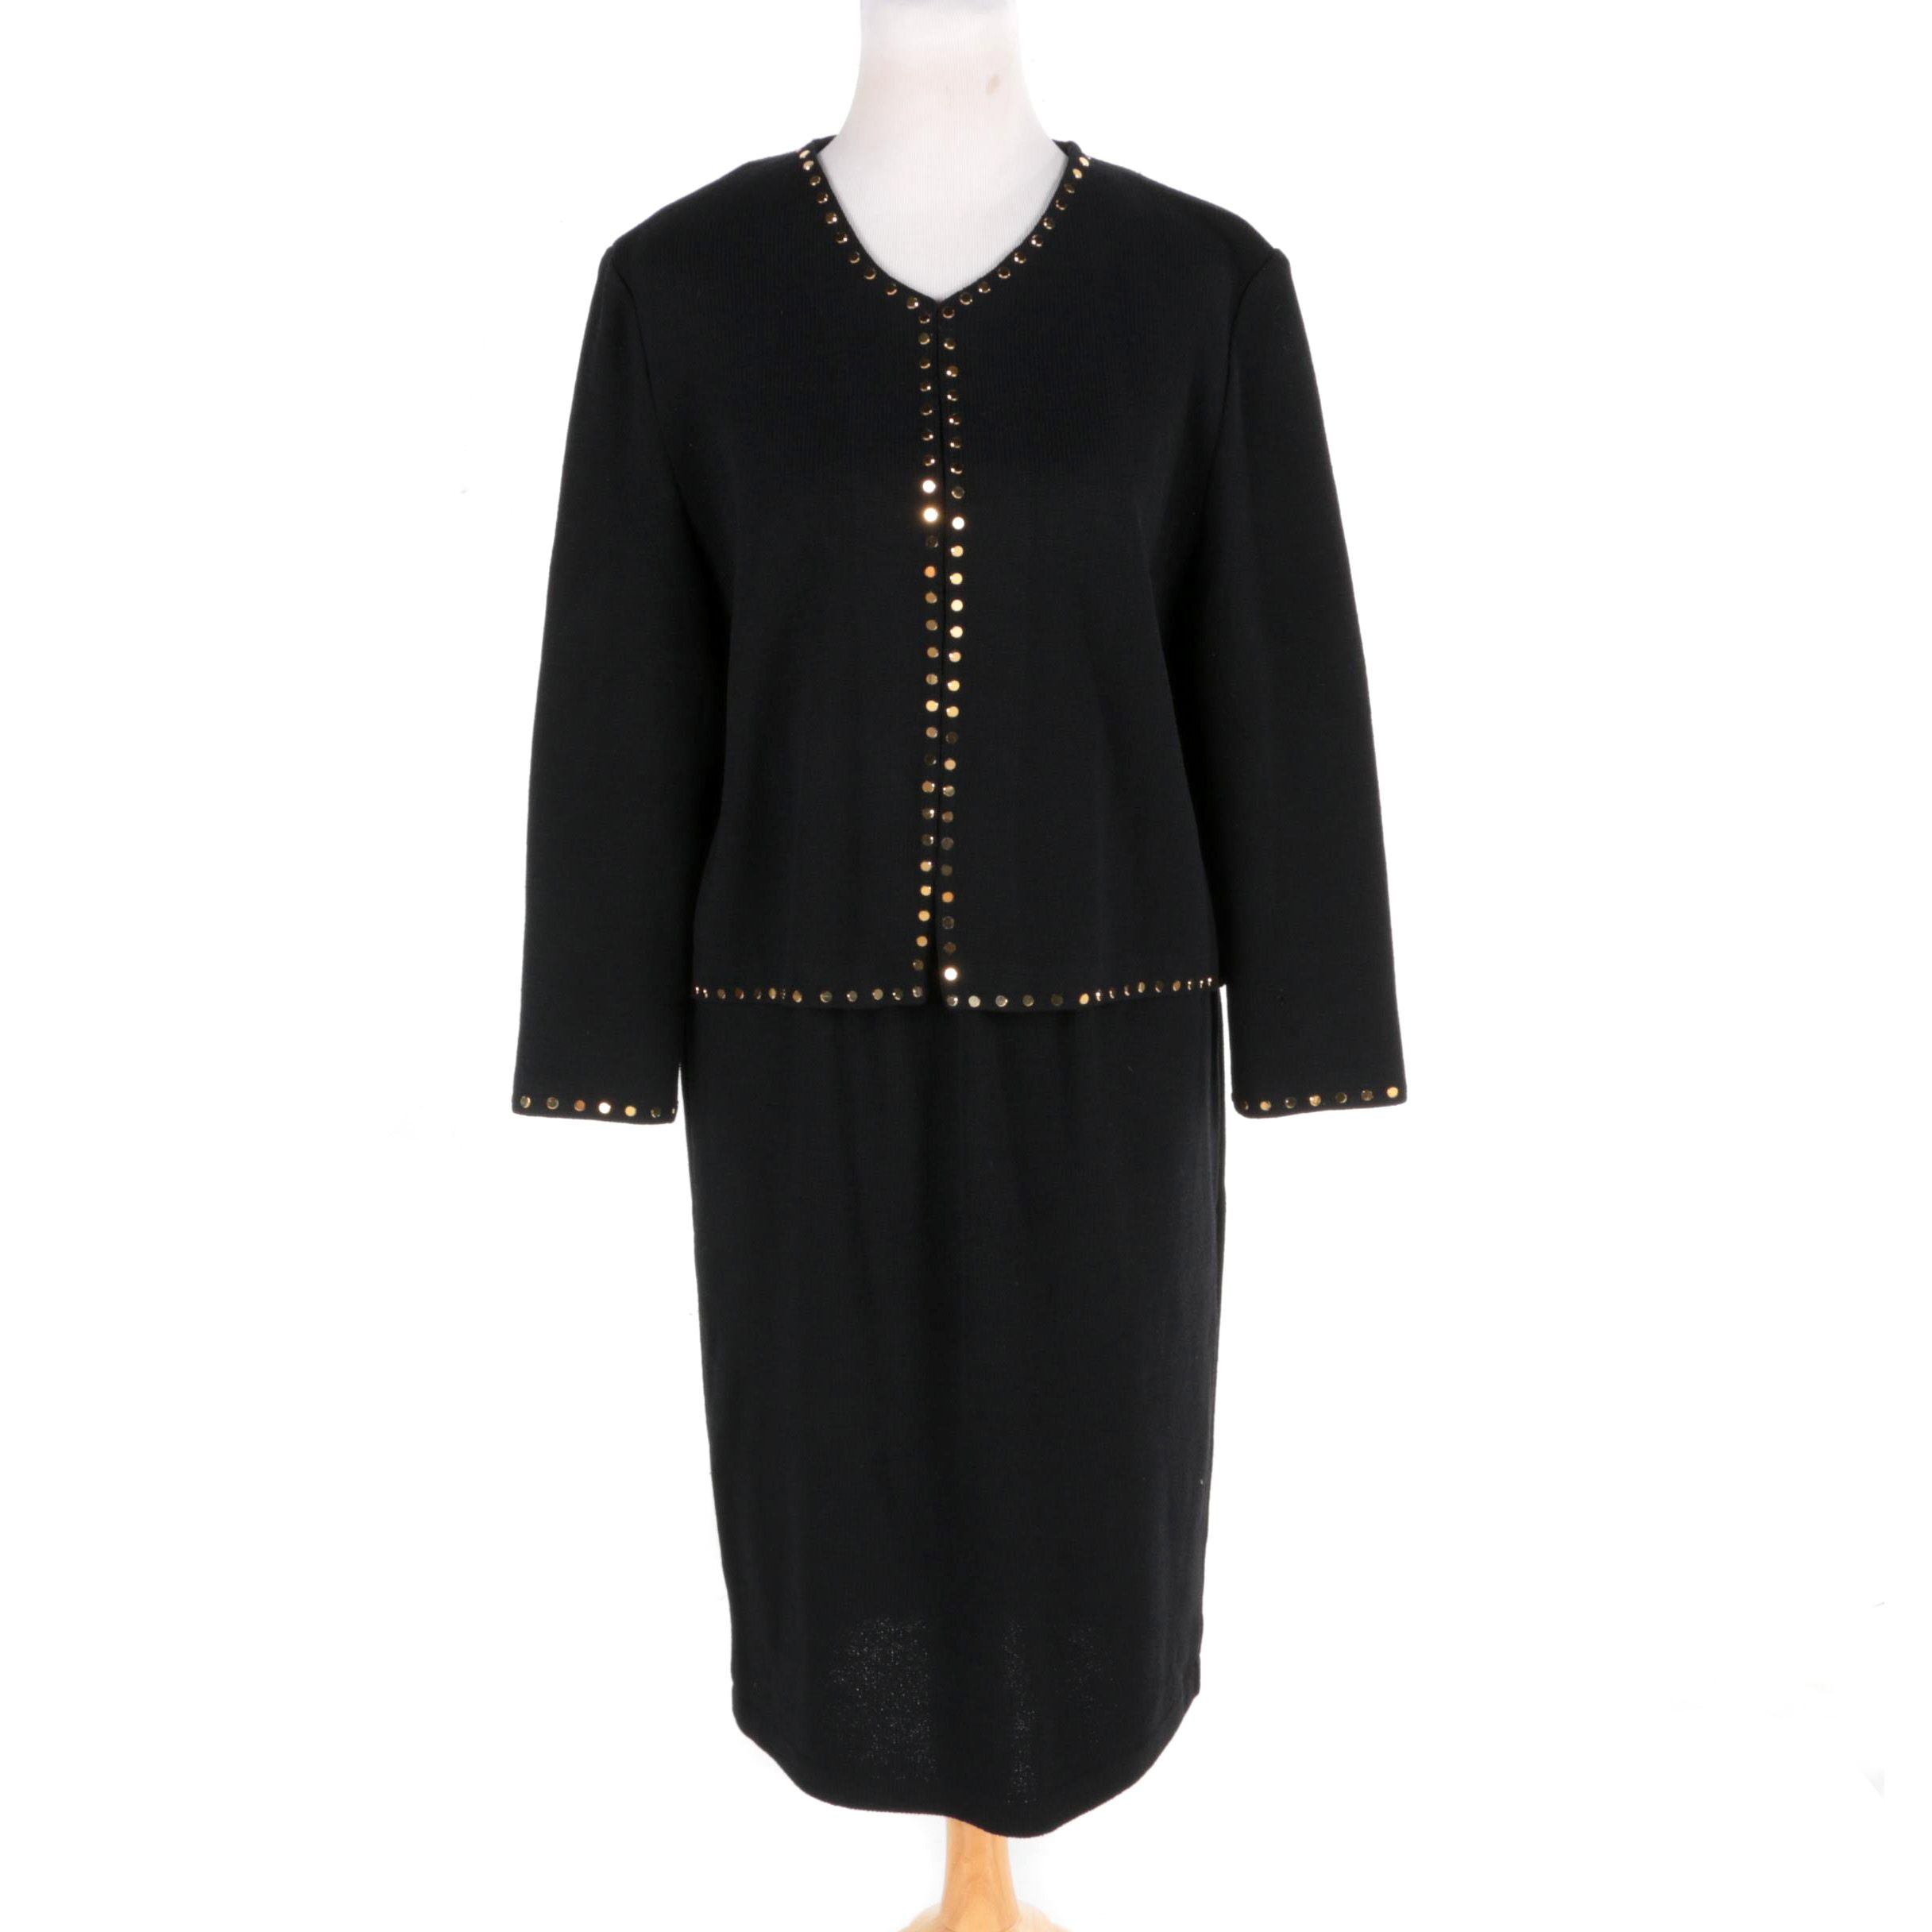 St. John Evening by Marie Gray Cardigan and St. John Basic Skirt